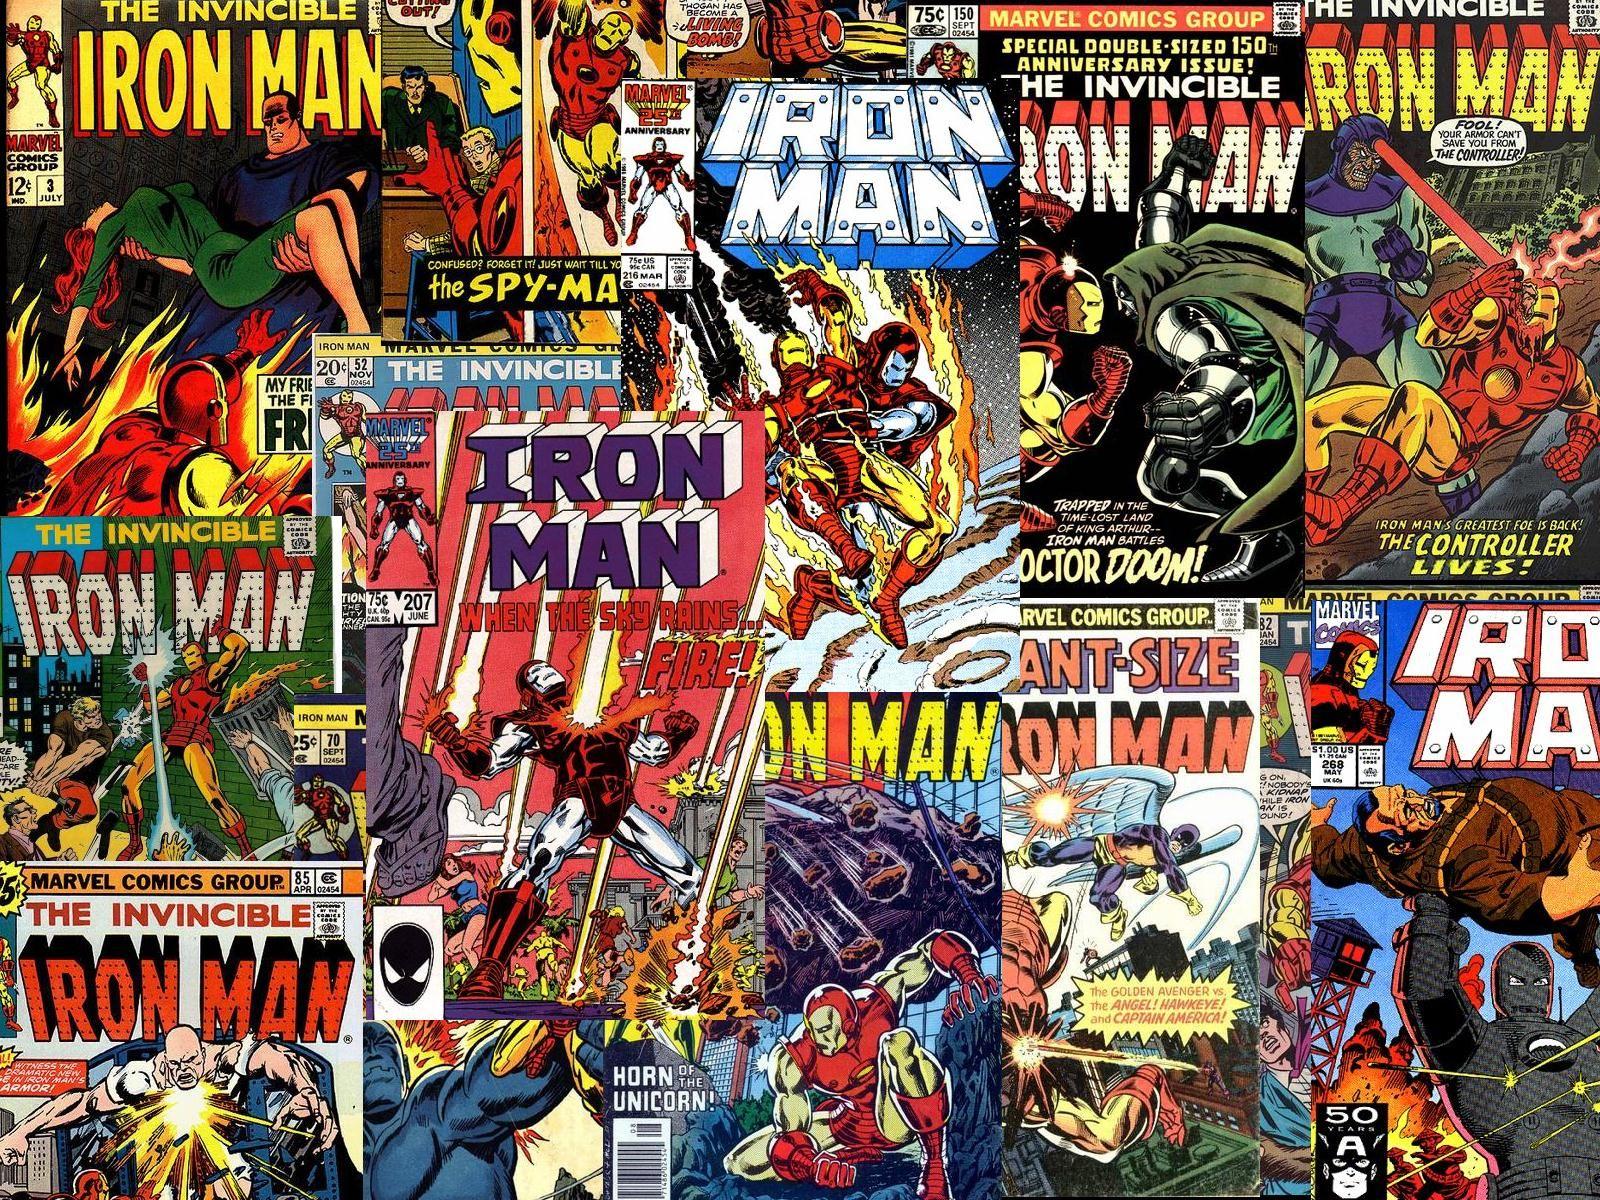 Download Vintage Comics Iron Man Wallpaper 1600x1200 | Full HD